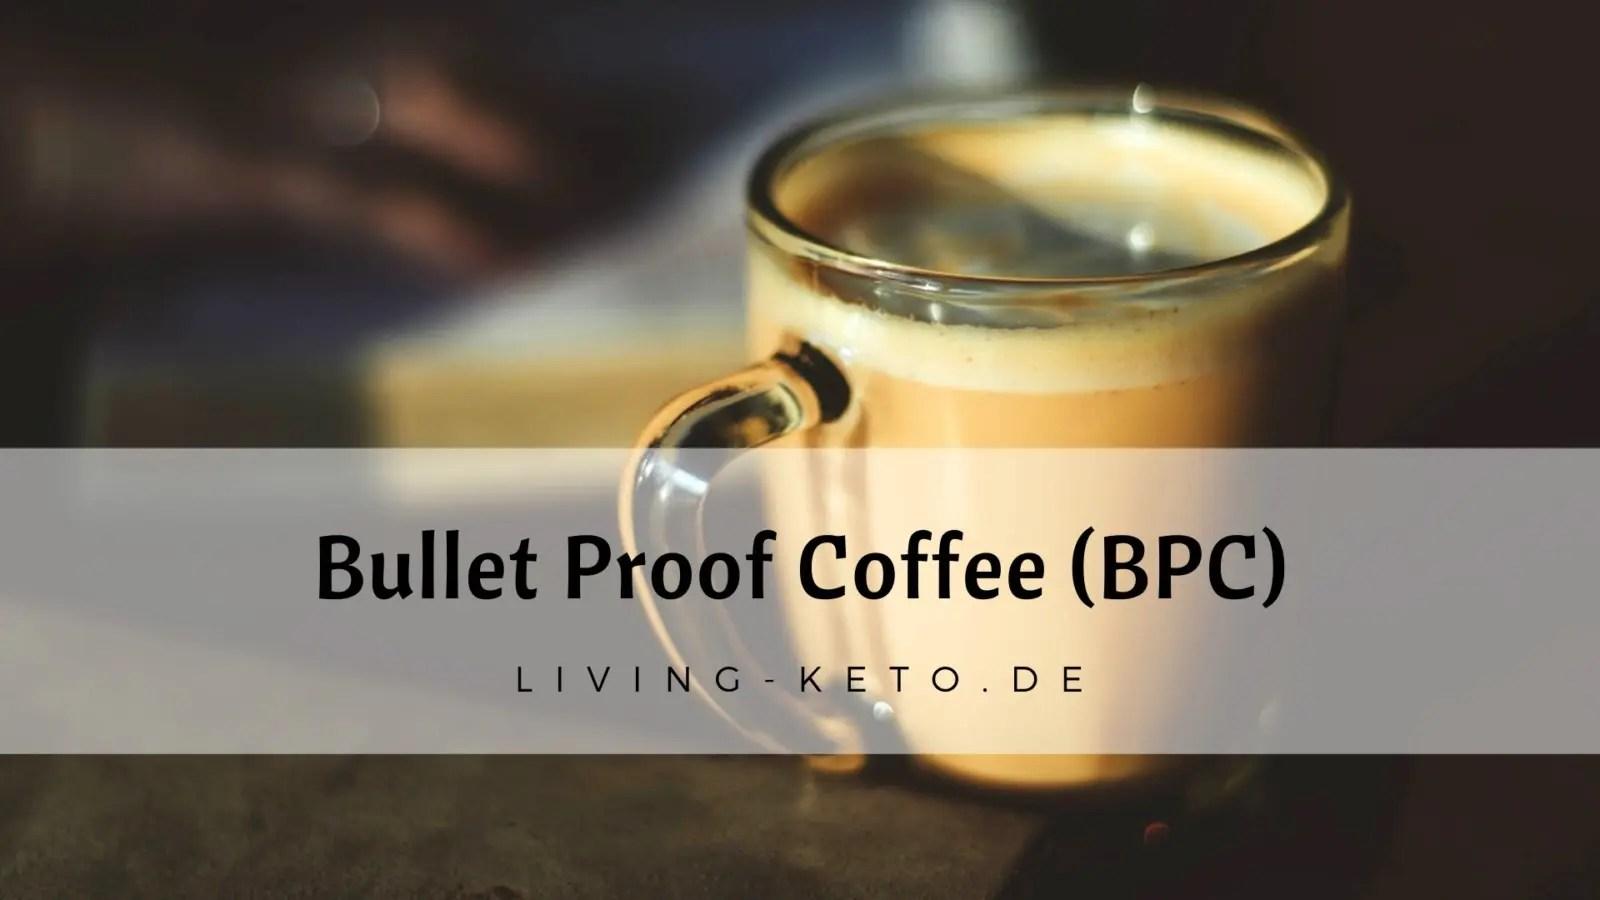 Bullet Proof Coffee (BPC)